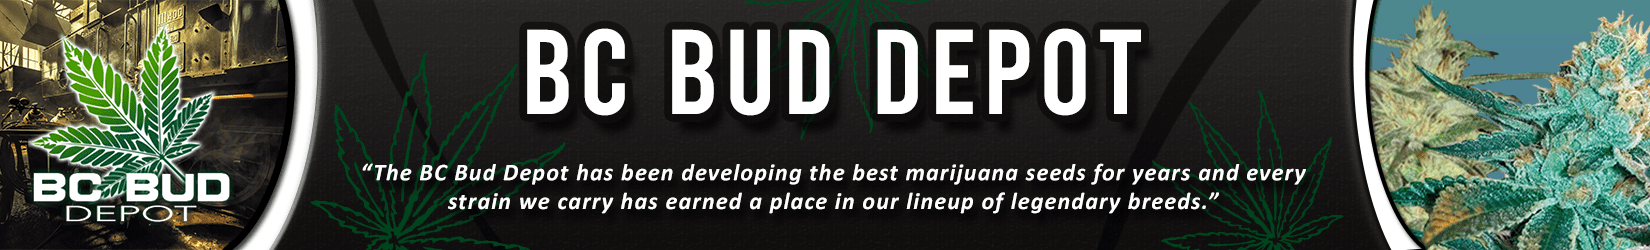 Cannabis Seeds Breeder - BC Bud Depot